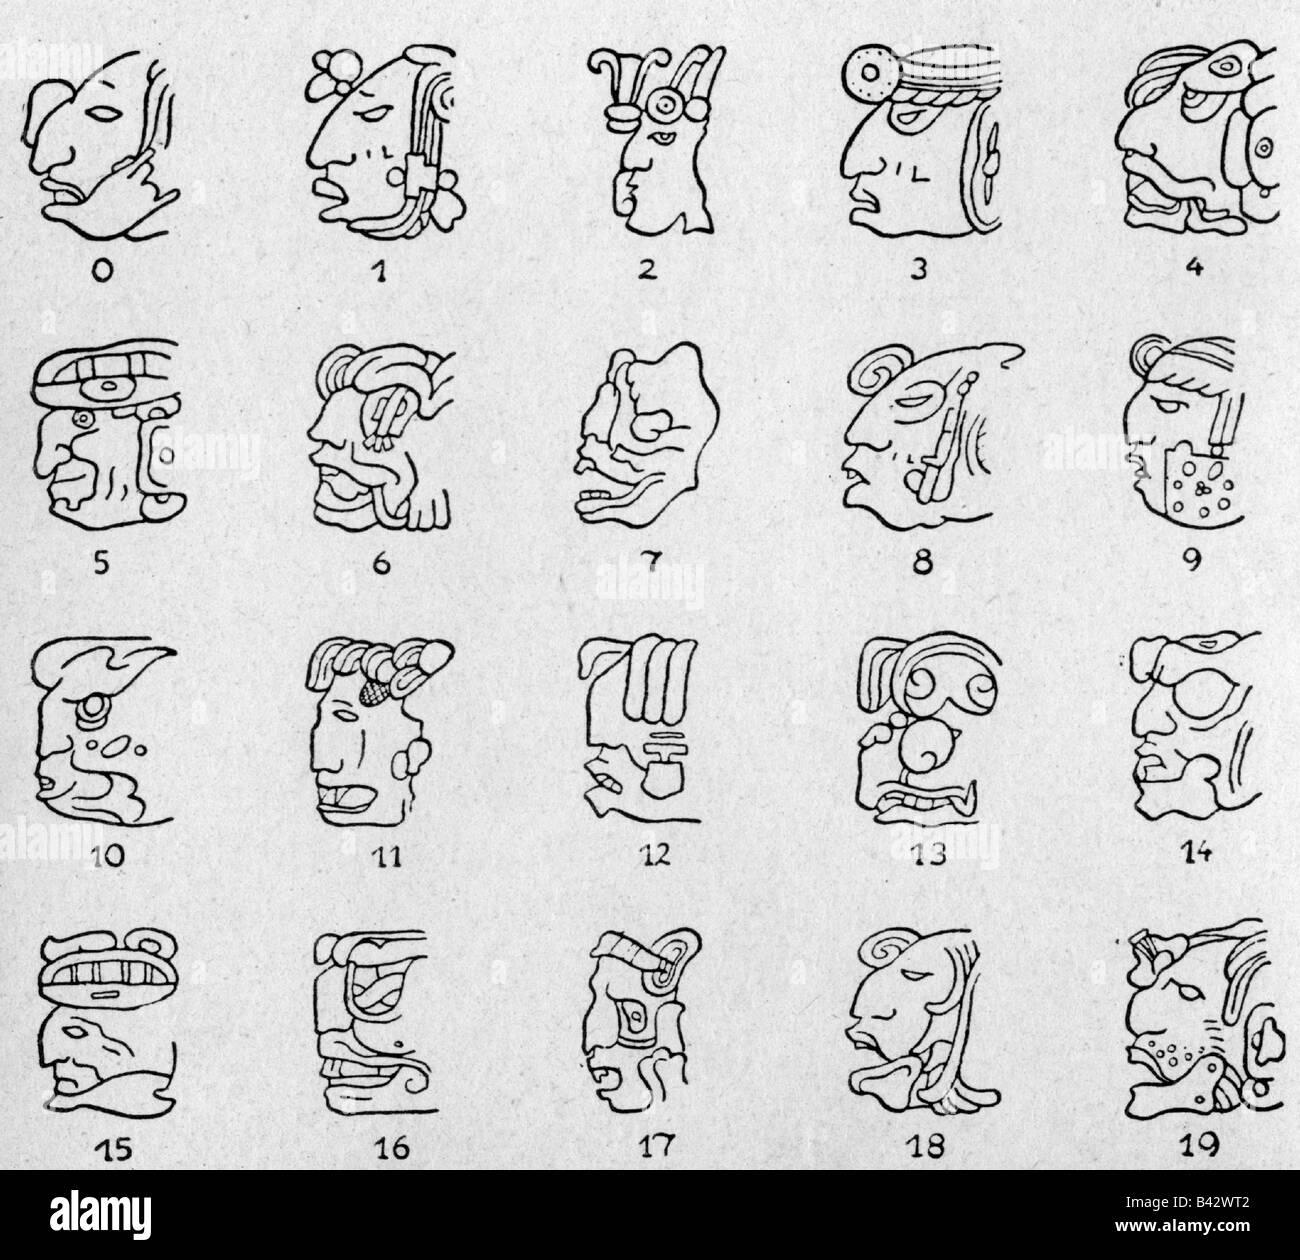 writing, characters, Maya hieroglyphs, figures, 0 - 19, J.E. Thompson, 'Civilization of the Mayas', 1927, - Stock Image